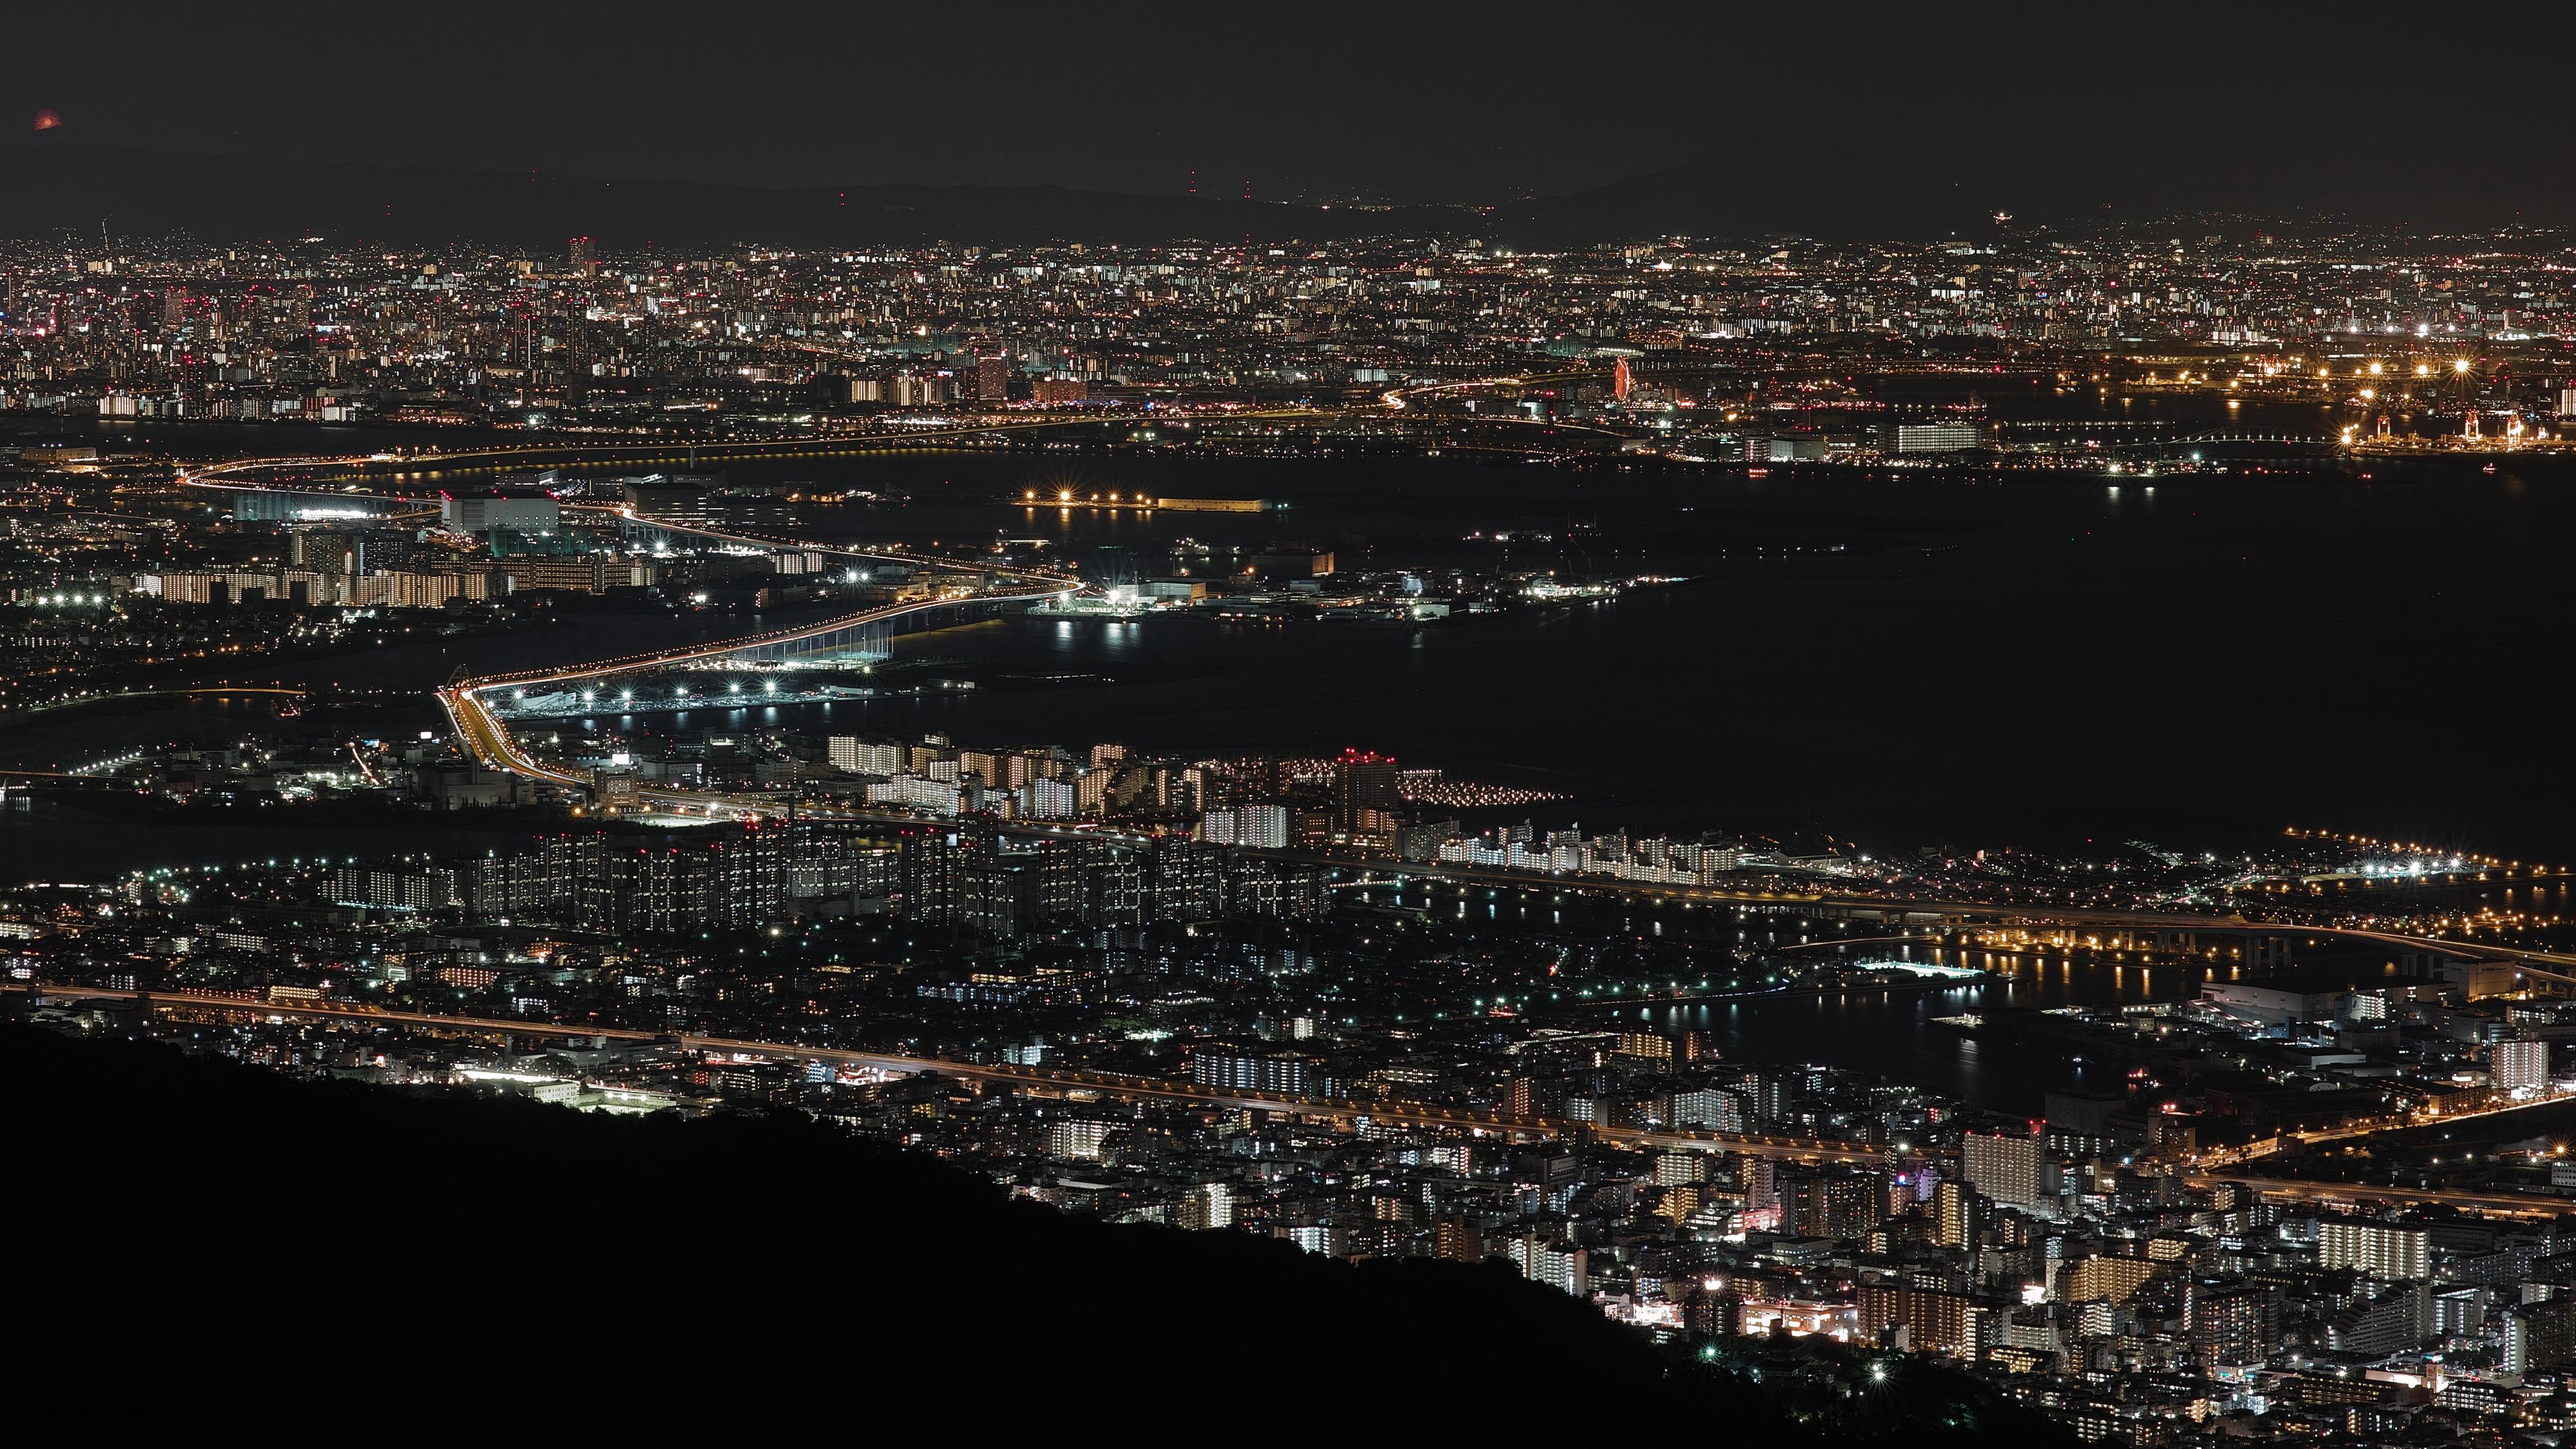 night city top view city lights bay osaka japan 4k 1538066261 - night city, top view, city lights, bay, osaka, japan 4k - top view, night city, city lights